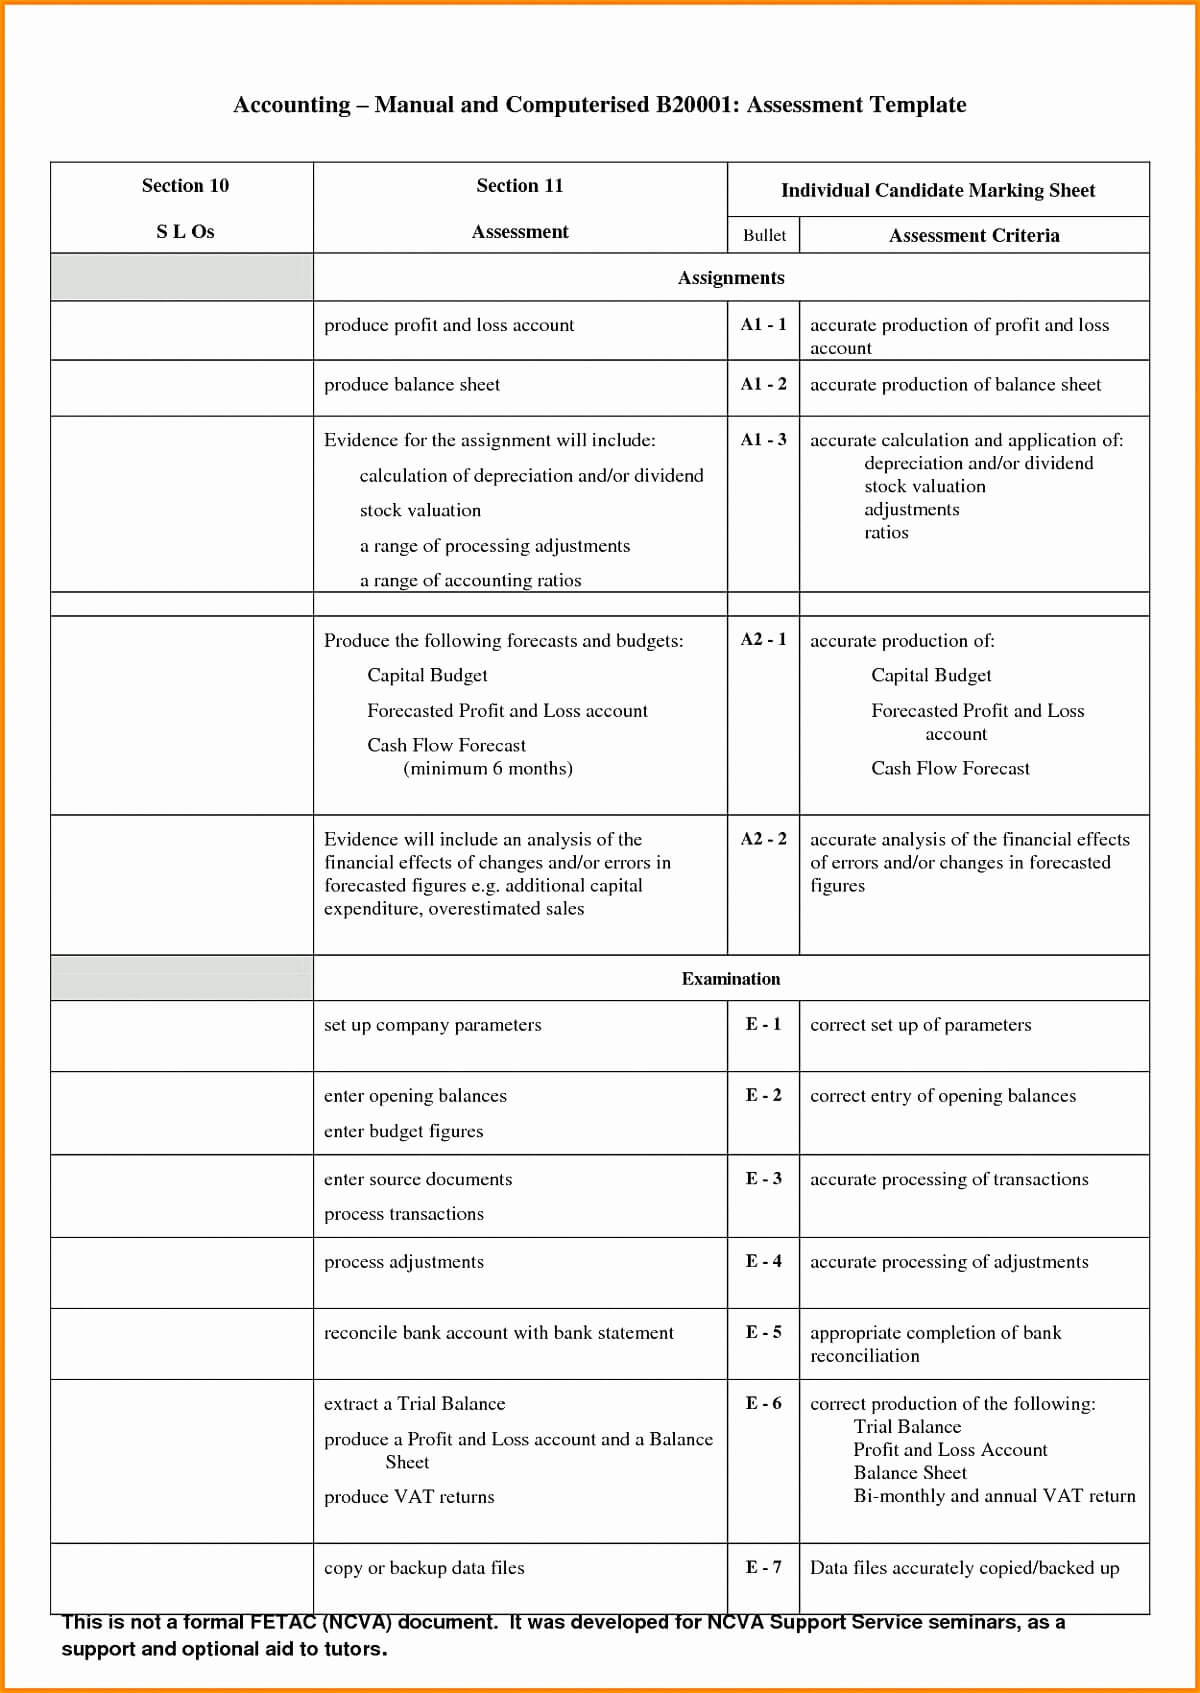 Business Valuation Report Template Worksheet Model Xls Small With Business Valuation Report Template Worksheet